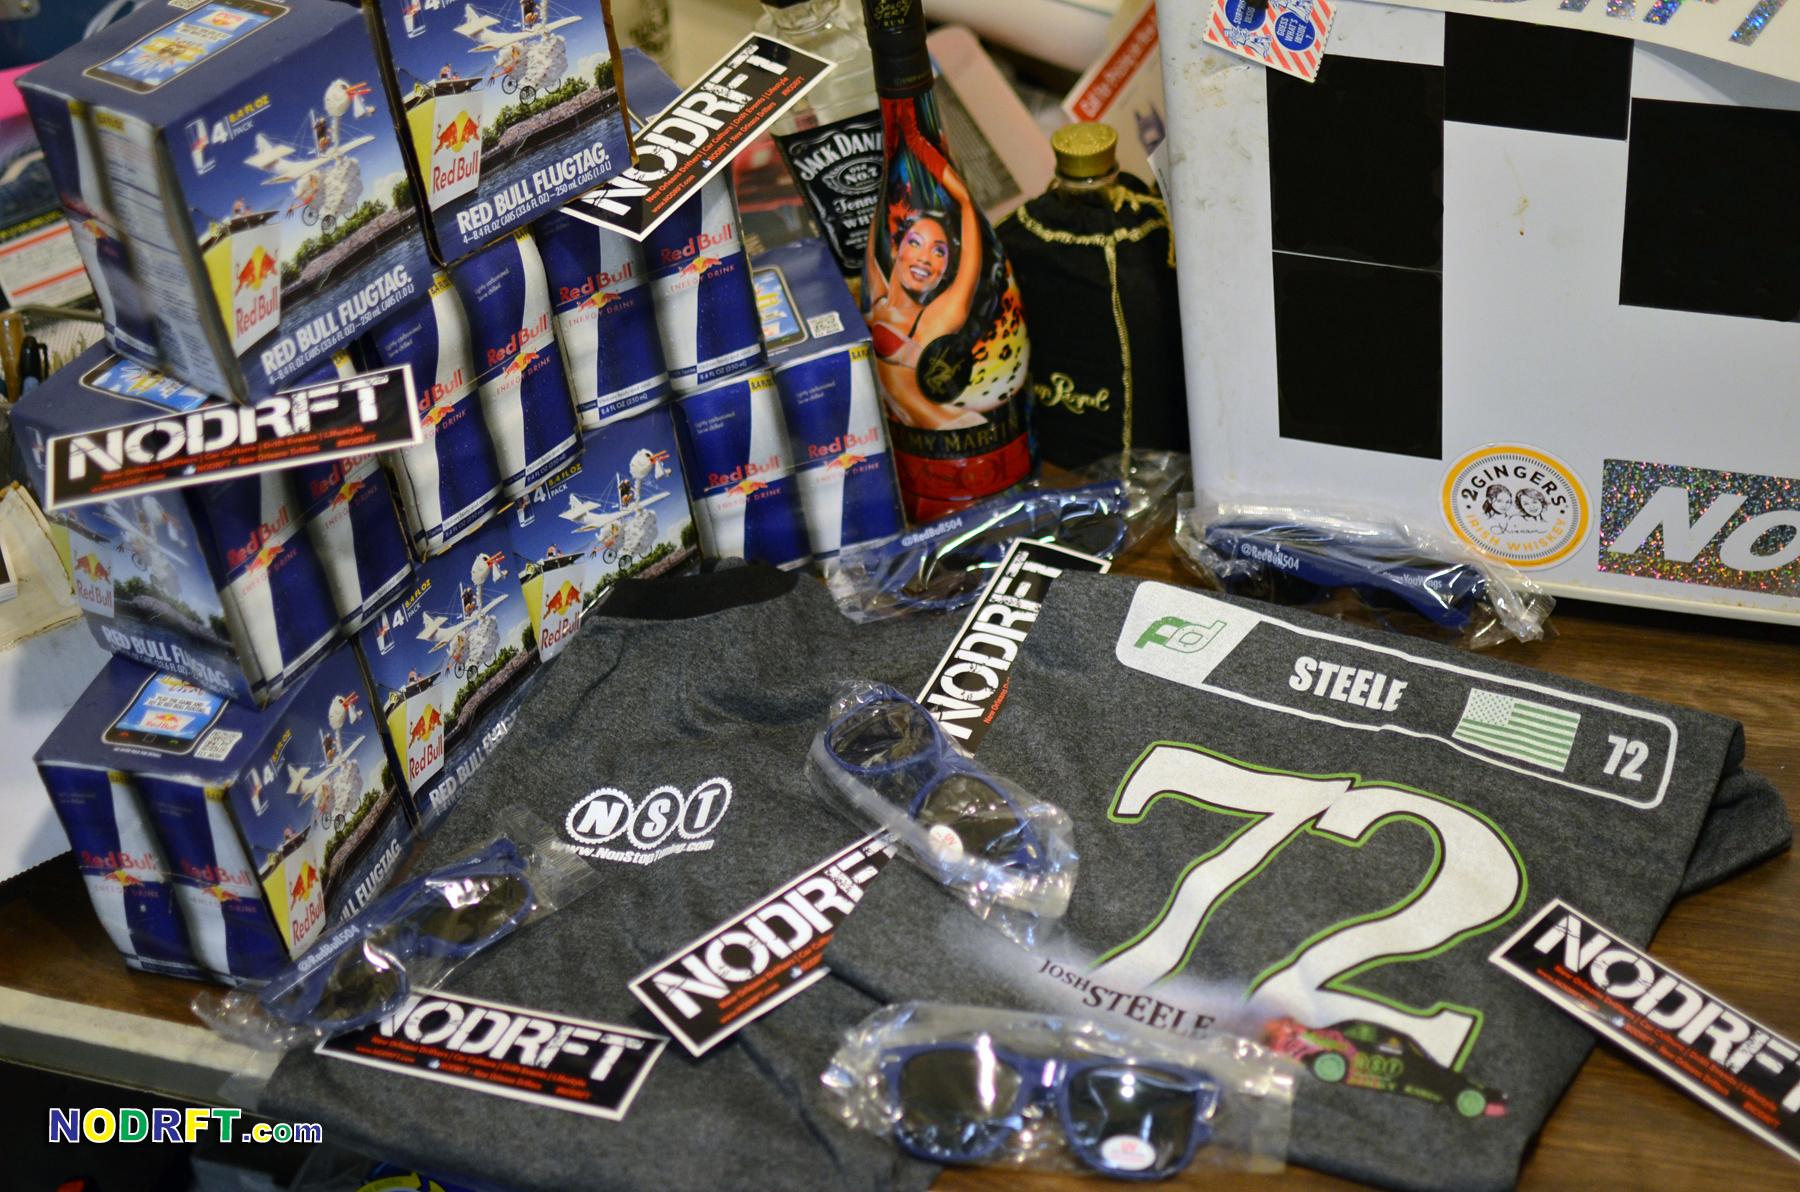 NST gift pack, NST tee, license plate frame, lanyard and N.D. slap sticker!